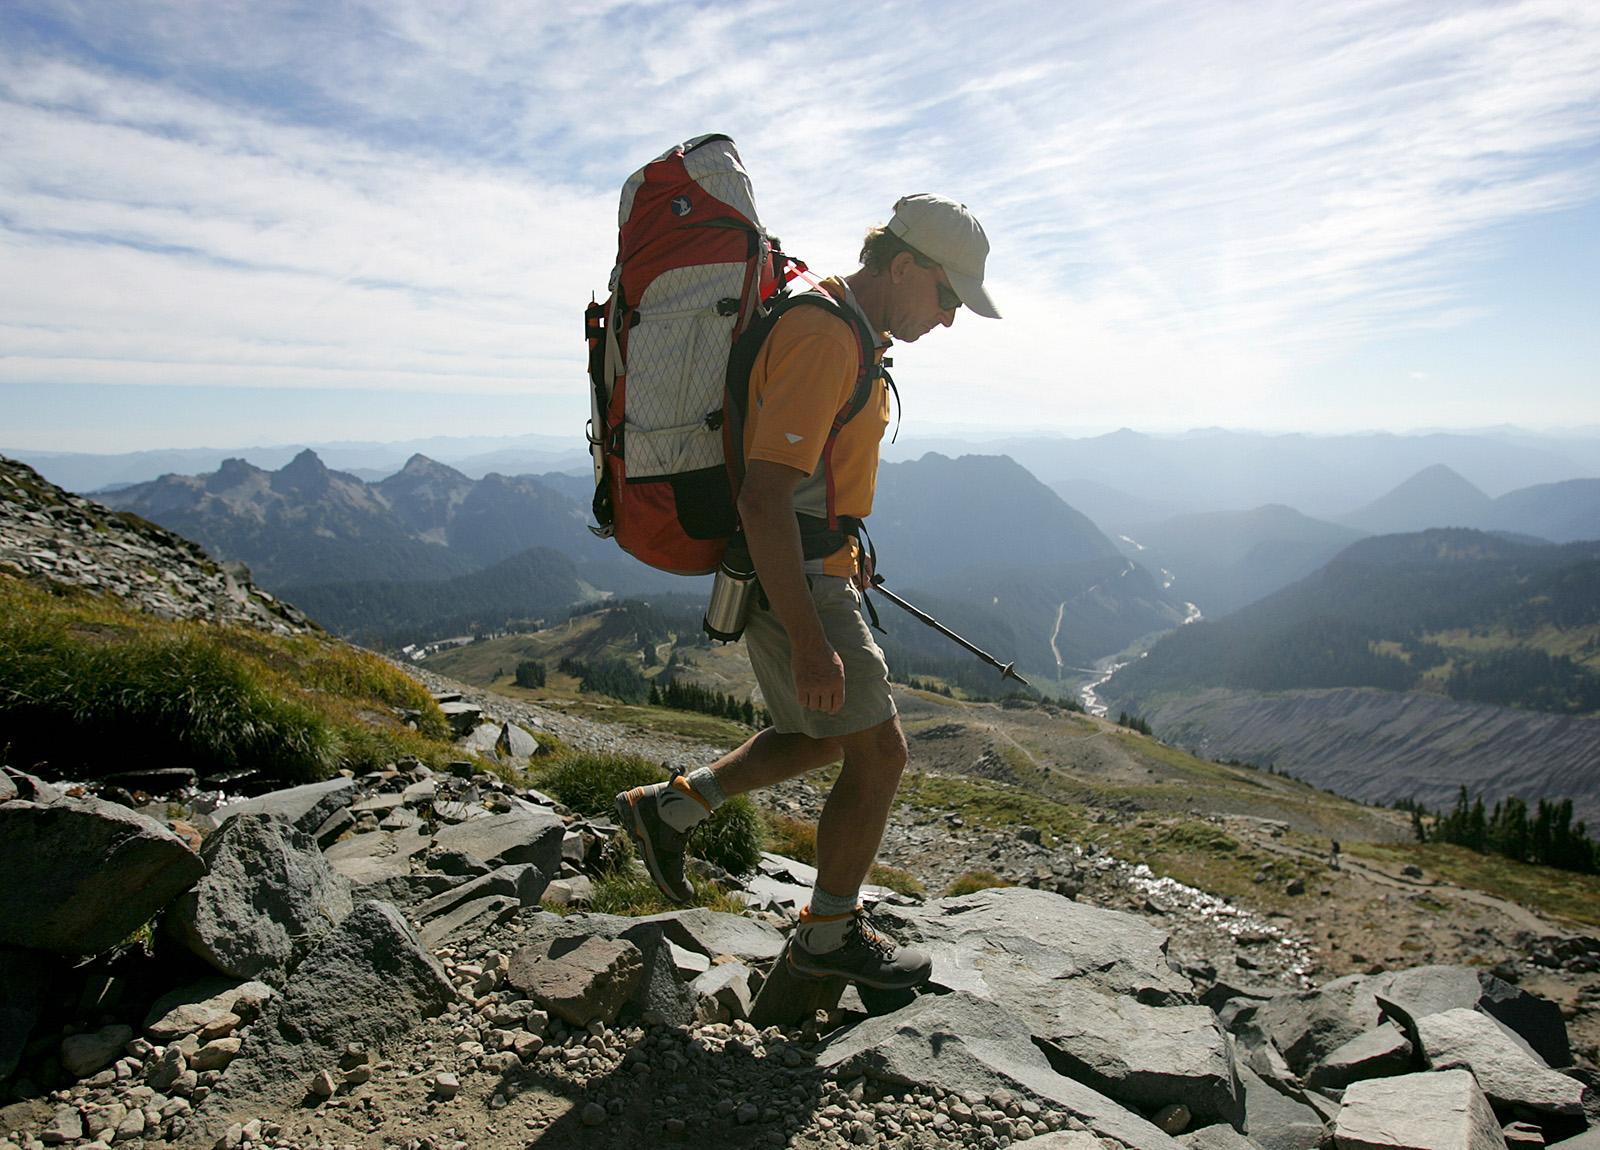 Ed Viesturs on Mount Rainier